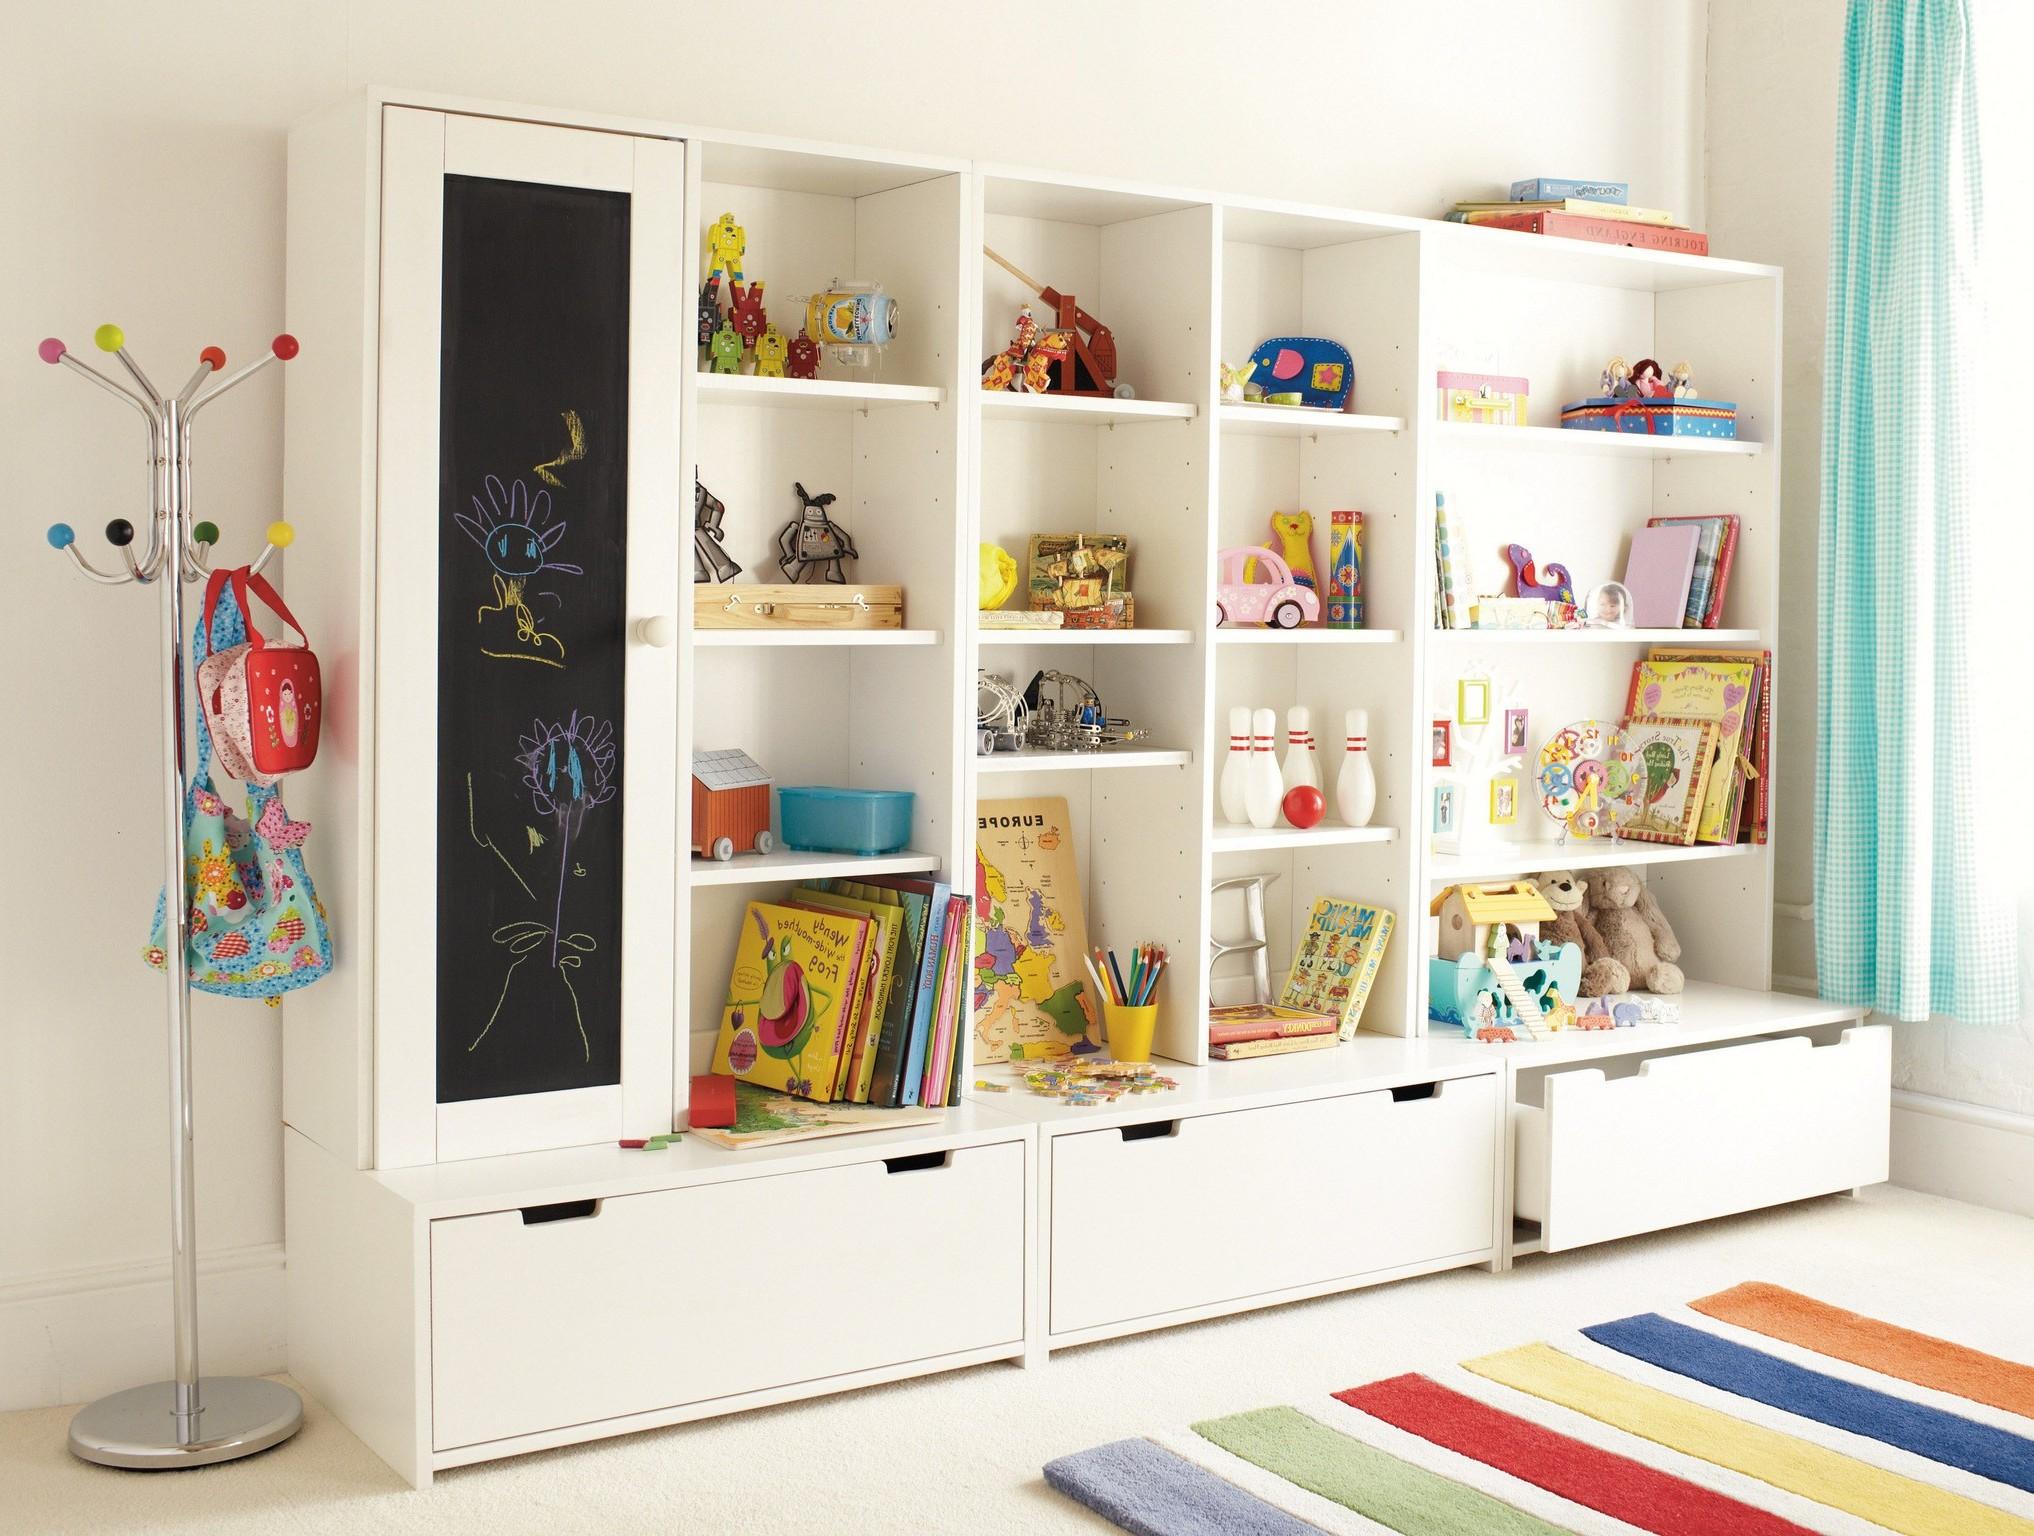 Children's room storage furniture fantastic children's room storage furniture 86 with additional living ideas JVFQCHP